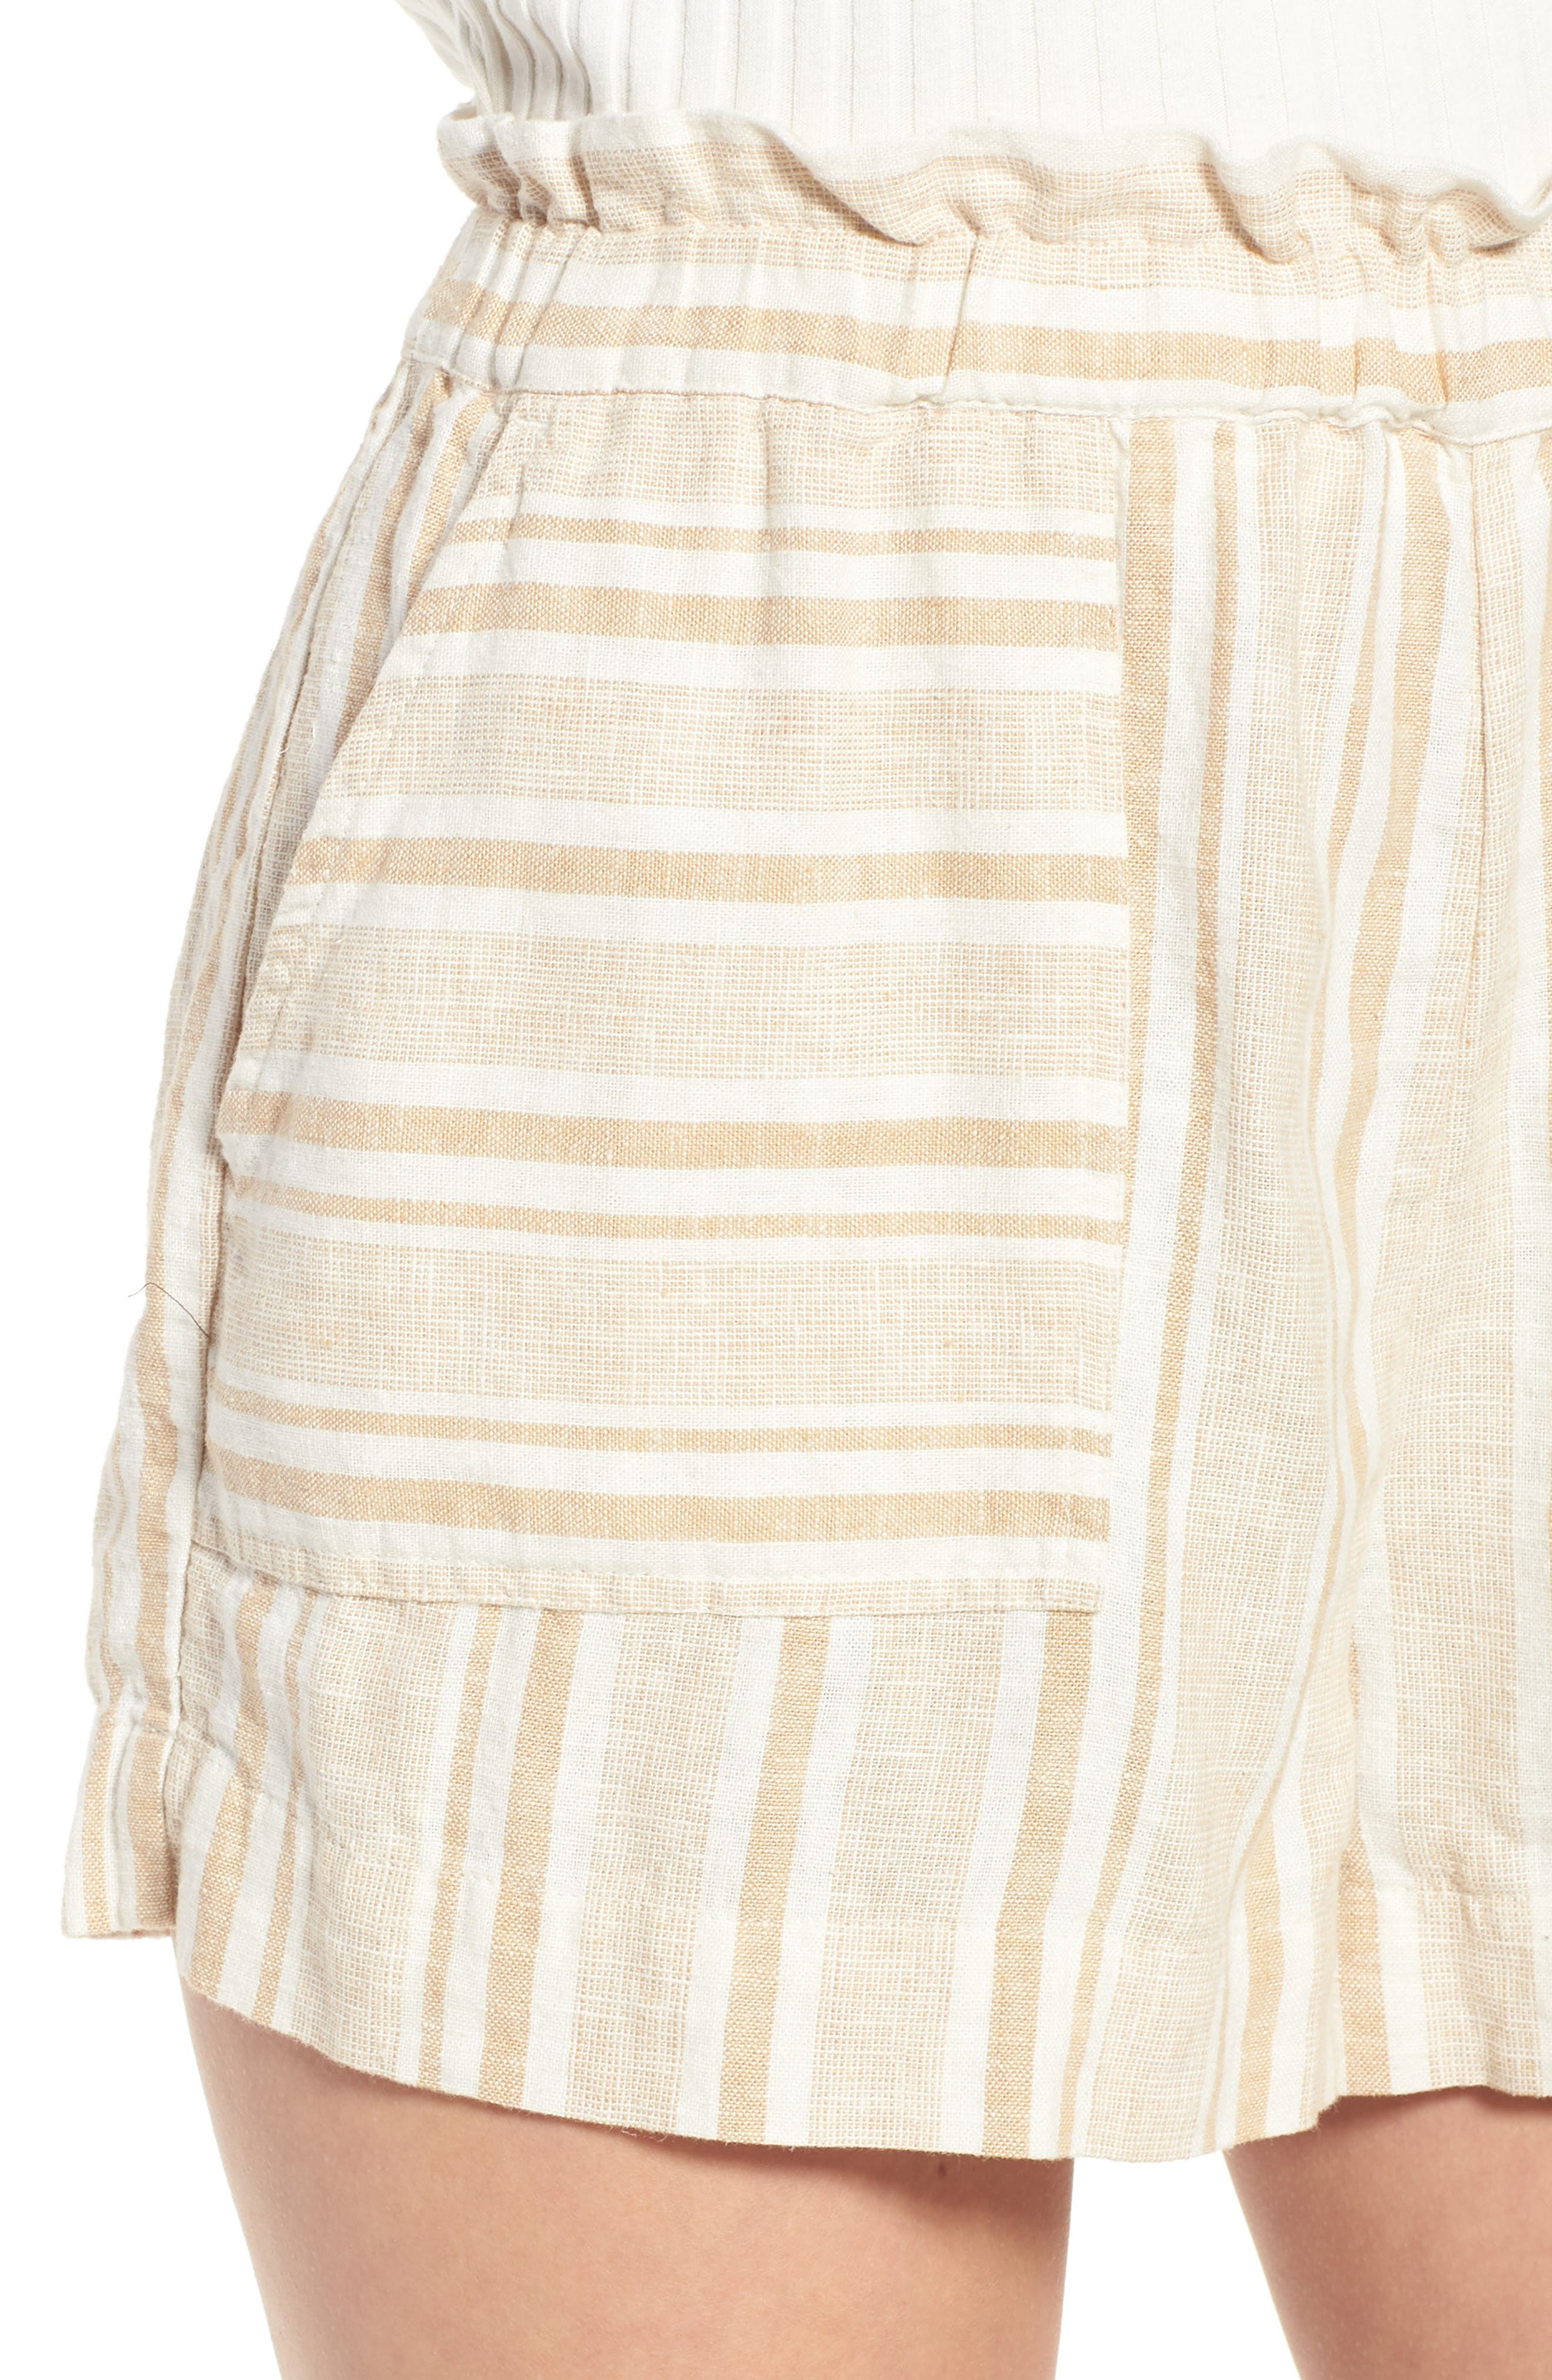 Stripe Linen Blend Shorts,                             Alternate thumbnail 4, color,                             Tan Lark Viola Stripe